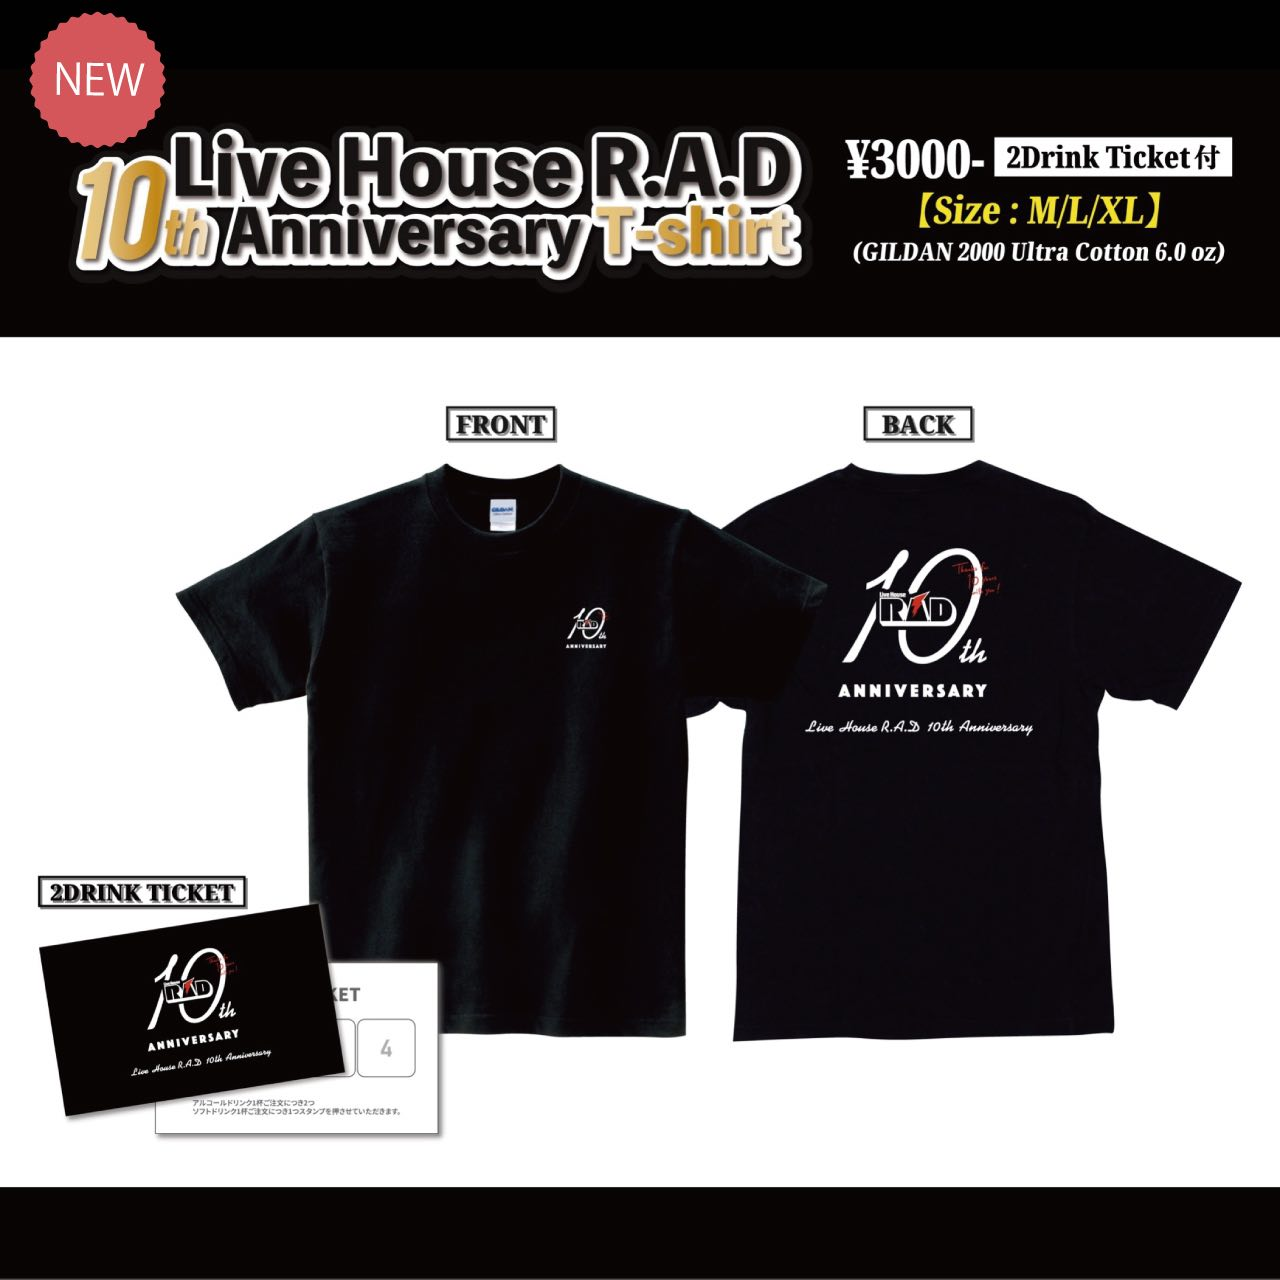 R.A.D10th Anniversary T-shirts